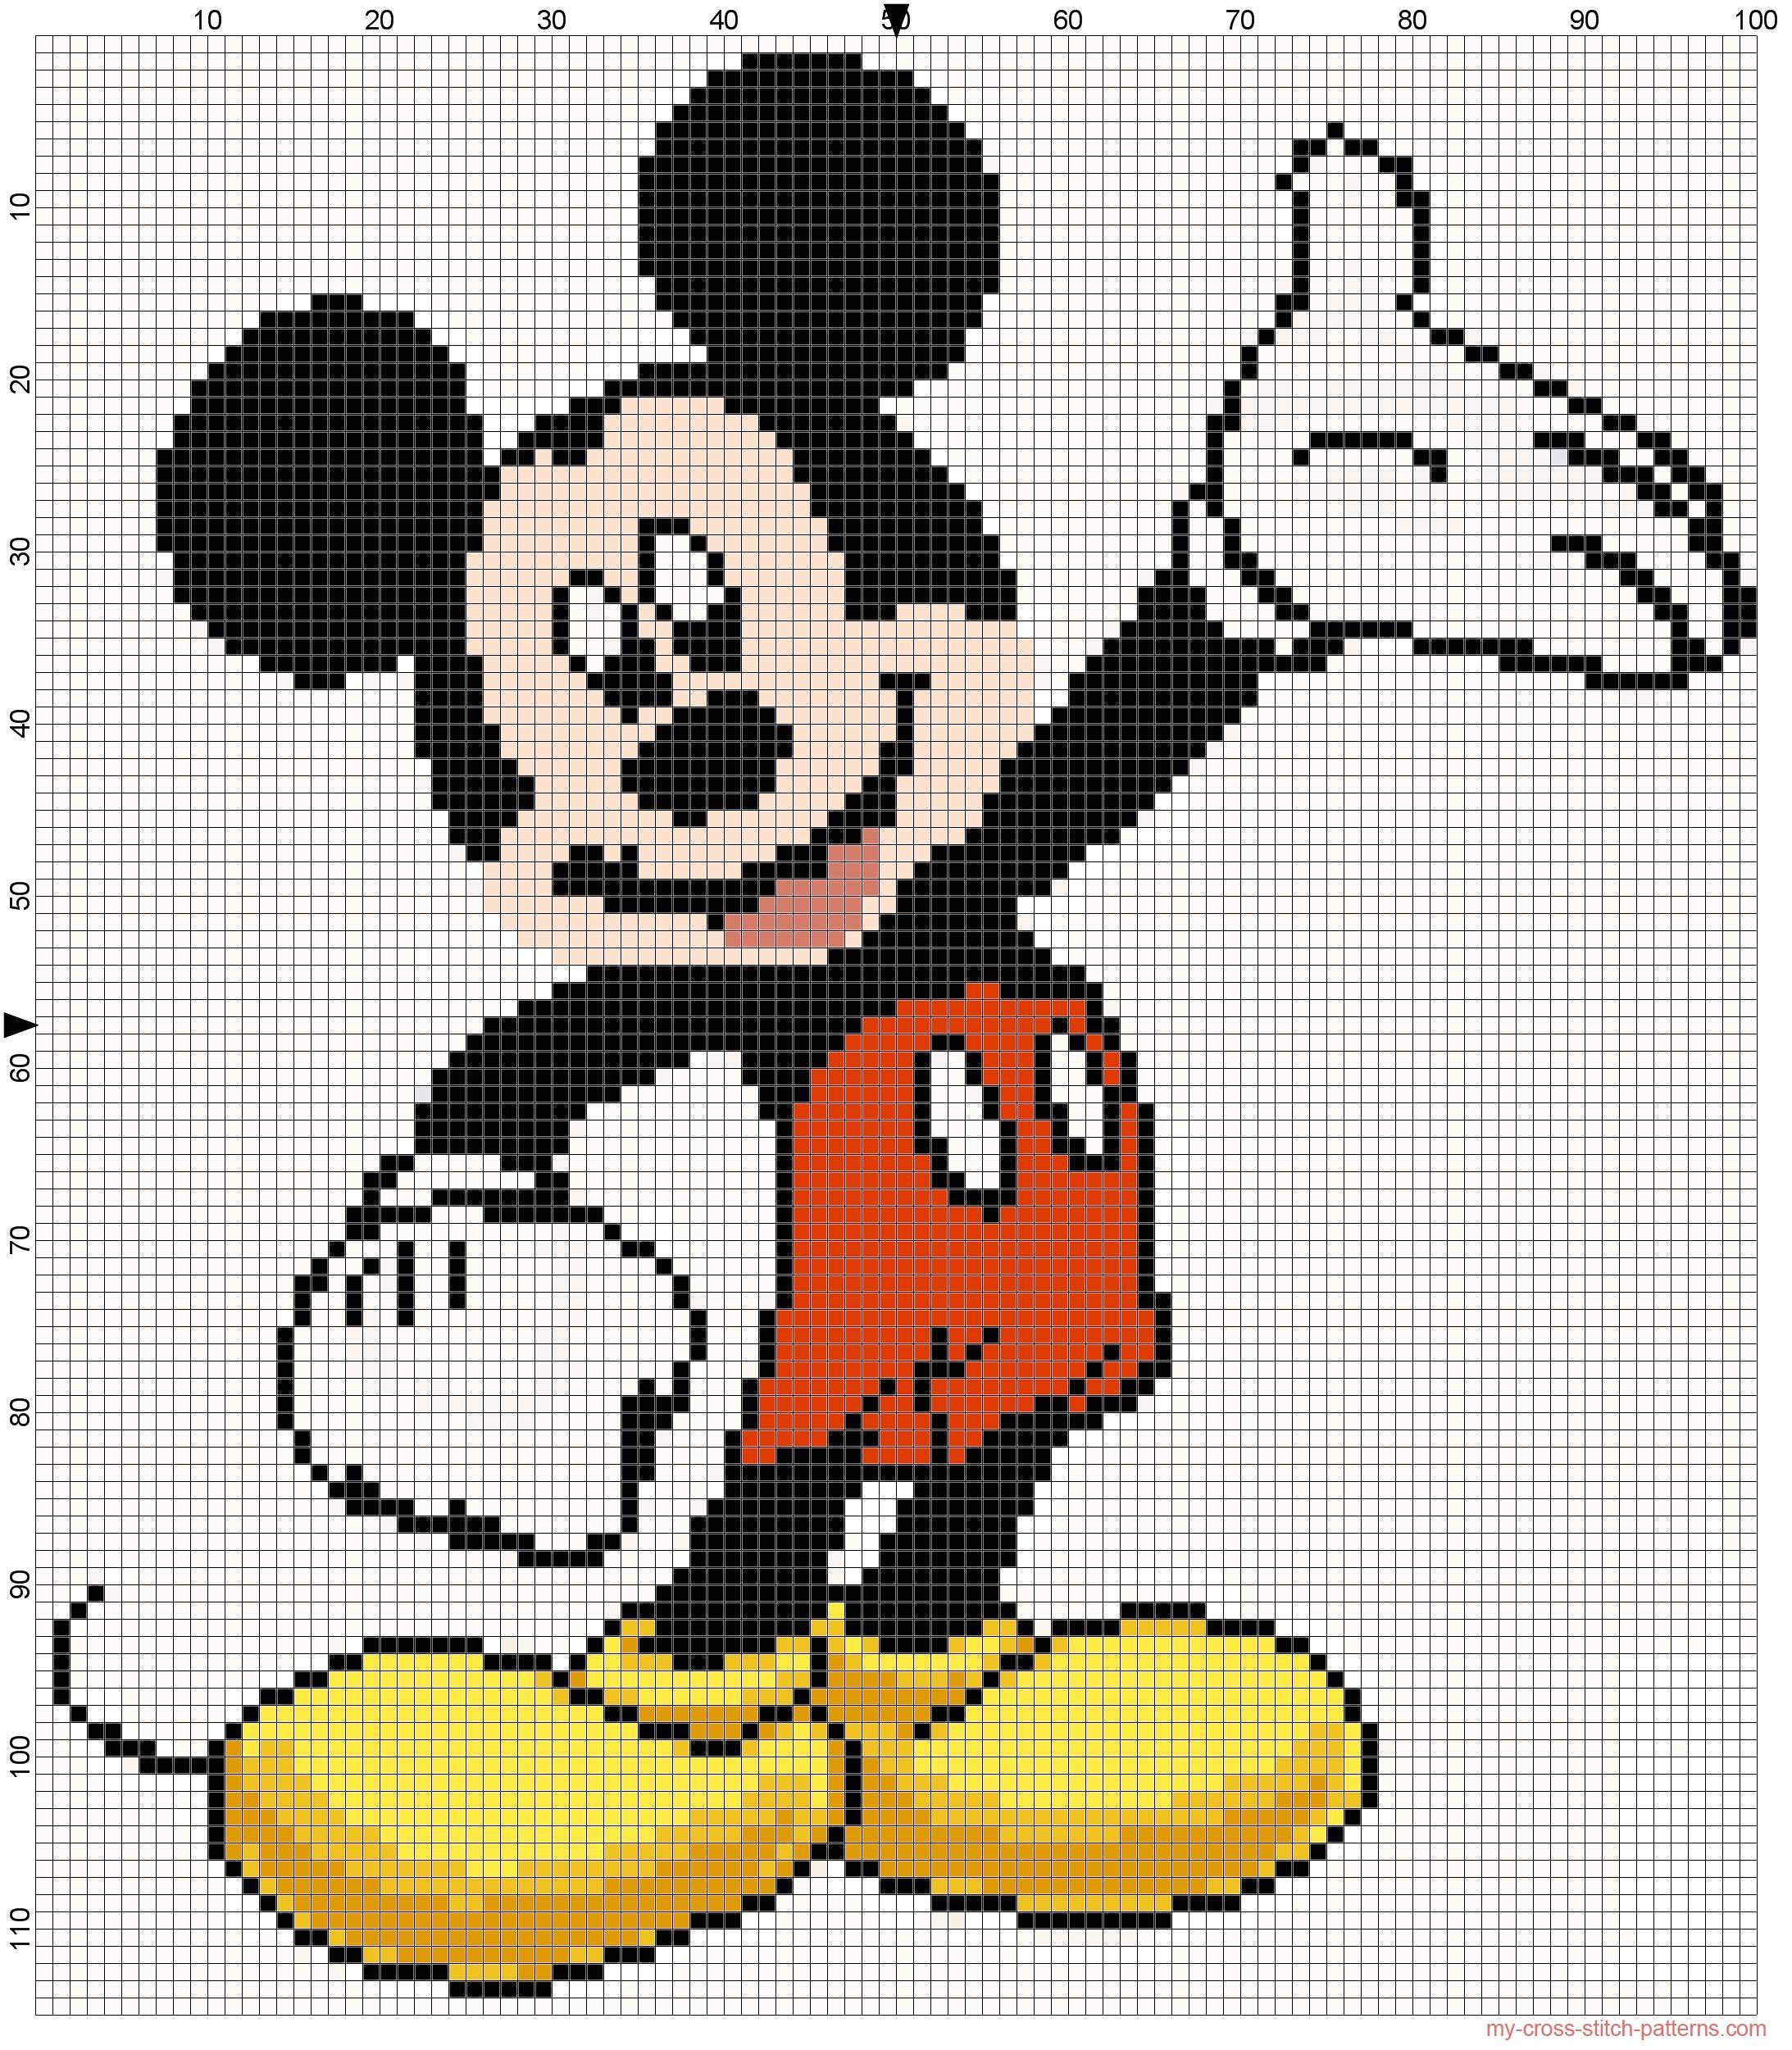 mickey_mouse_cross_stitch_pattern